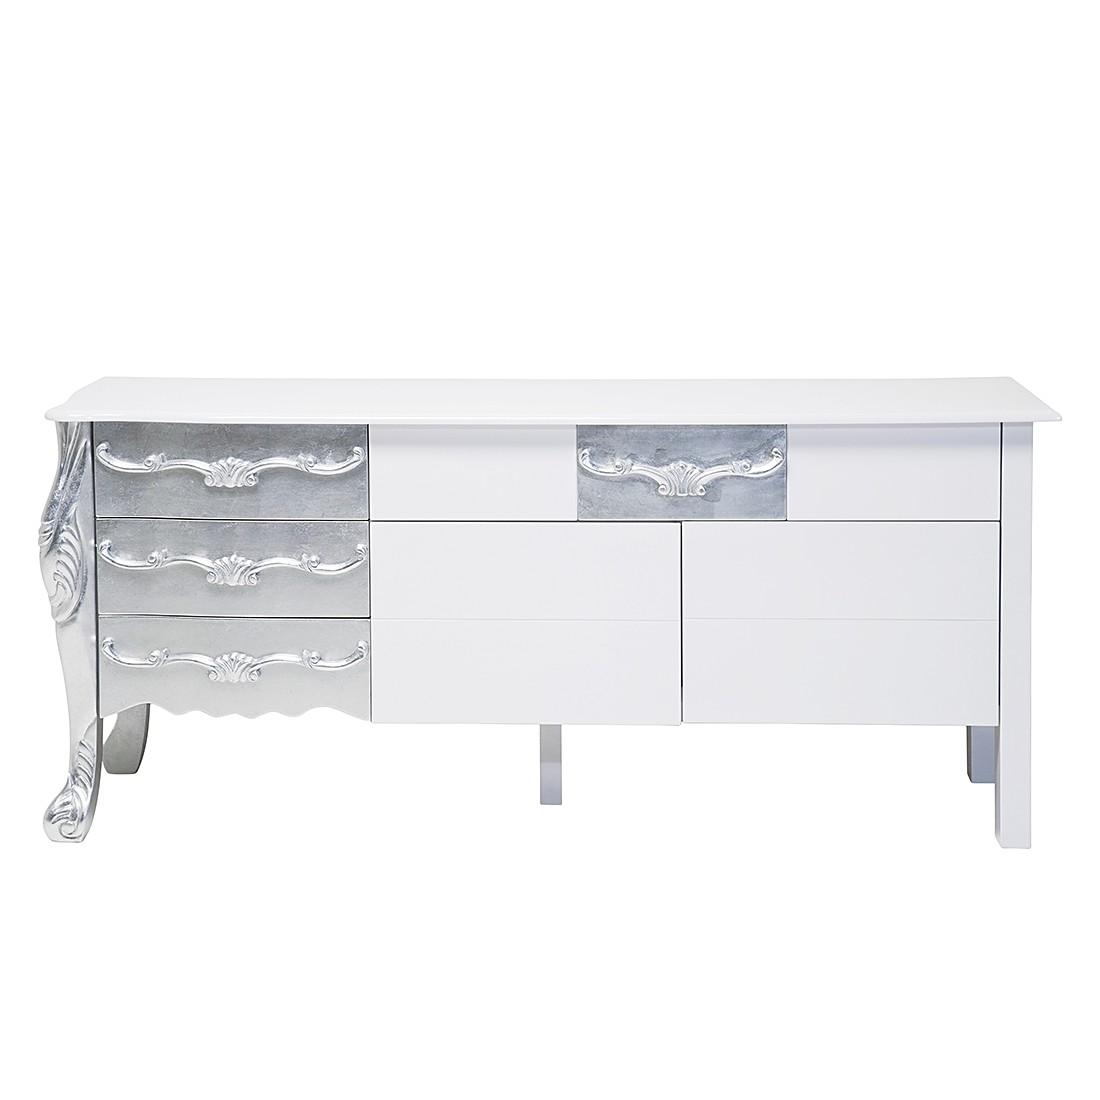 Sideboard Janus, Kare Design